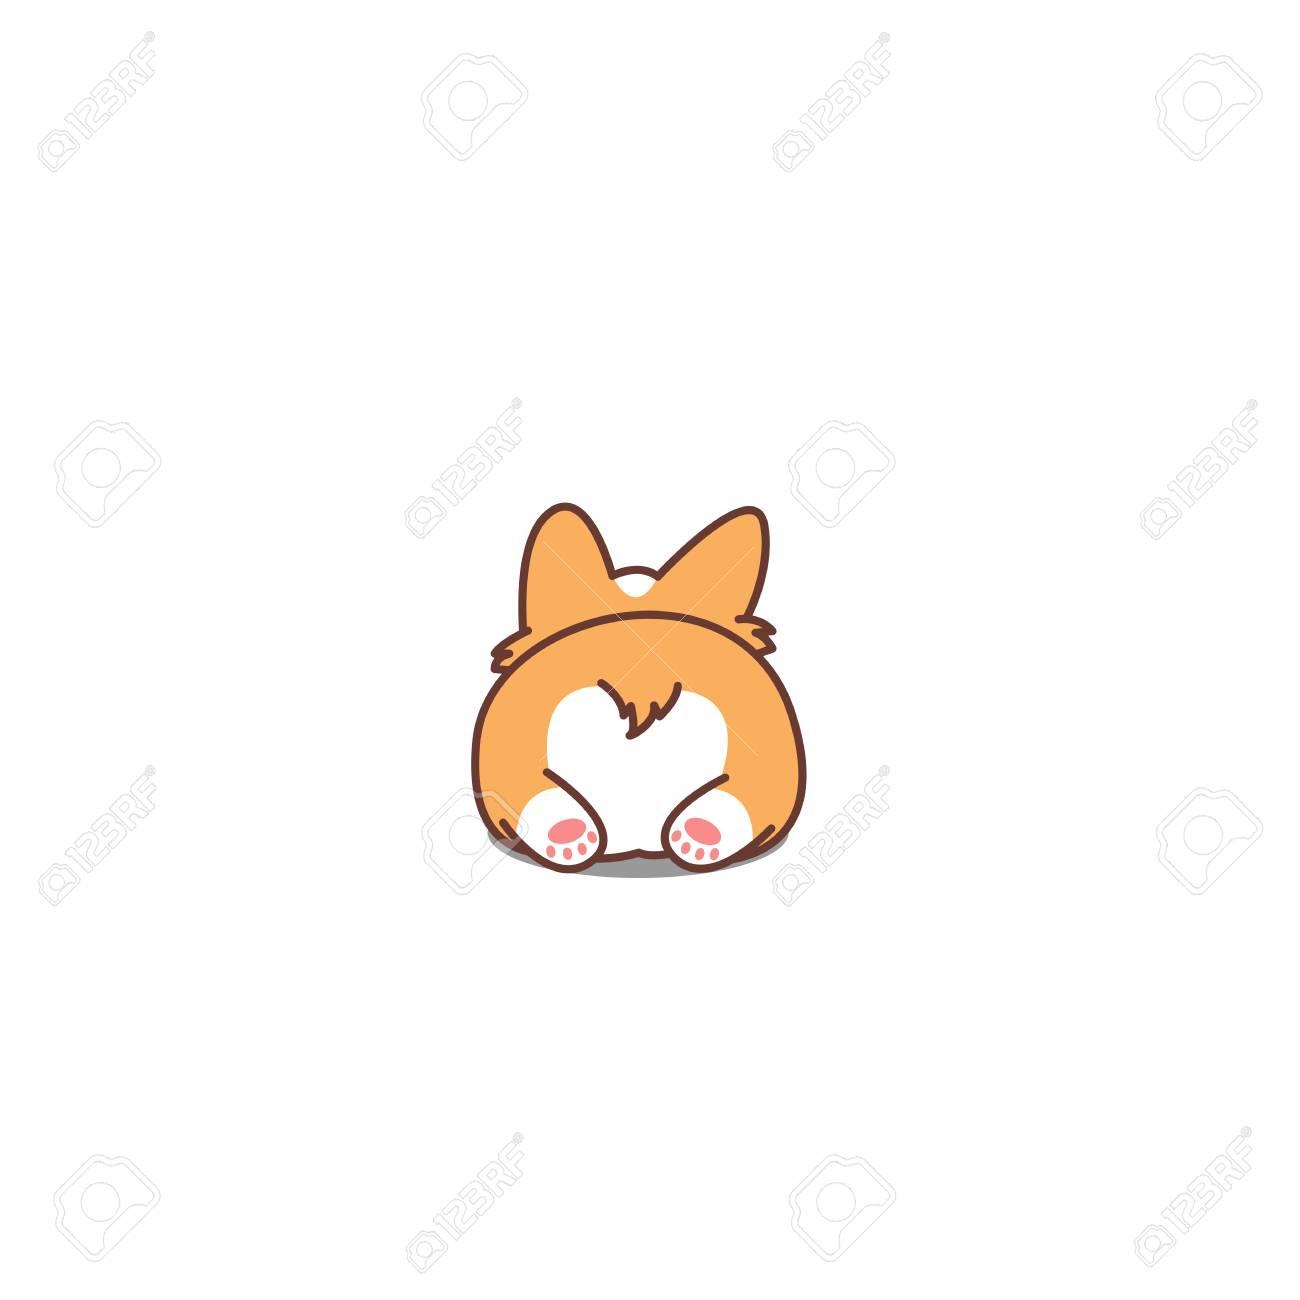 Cute corgi butt, vector illustration.